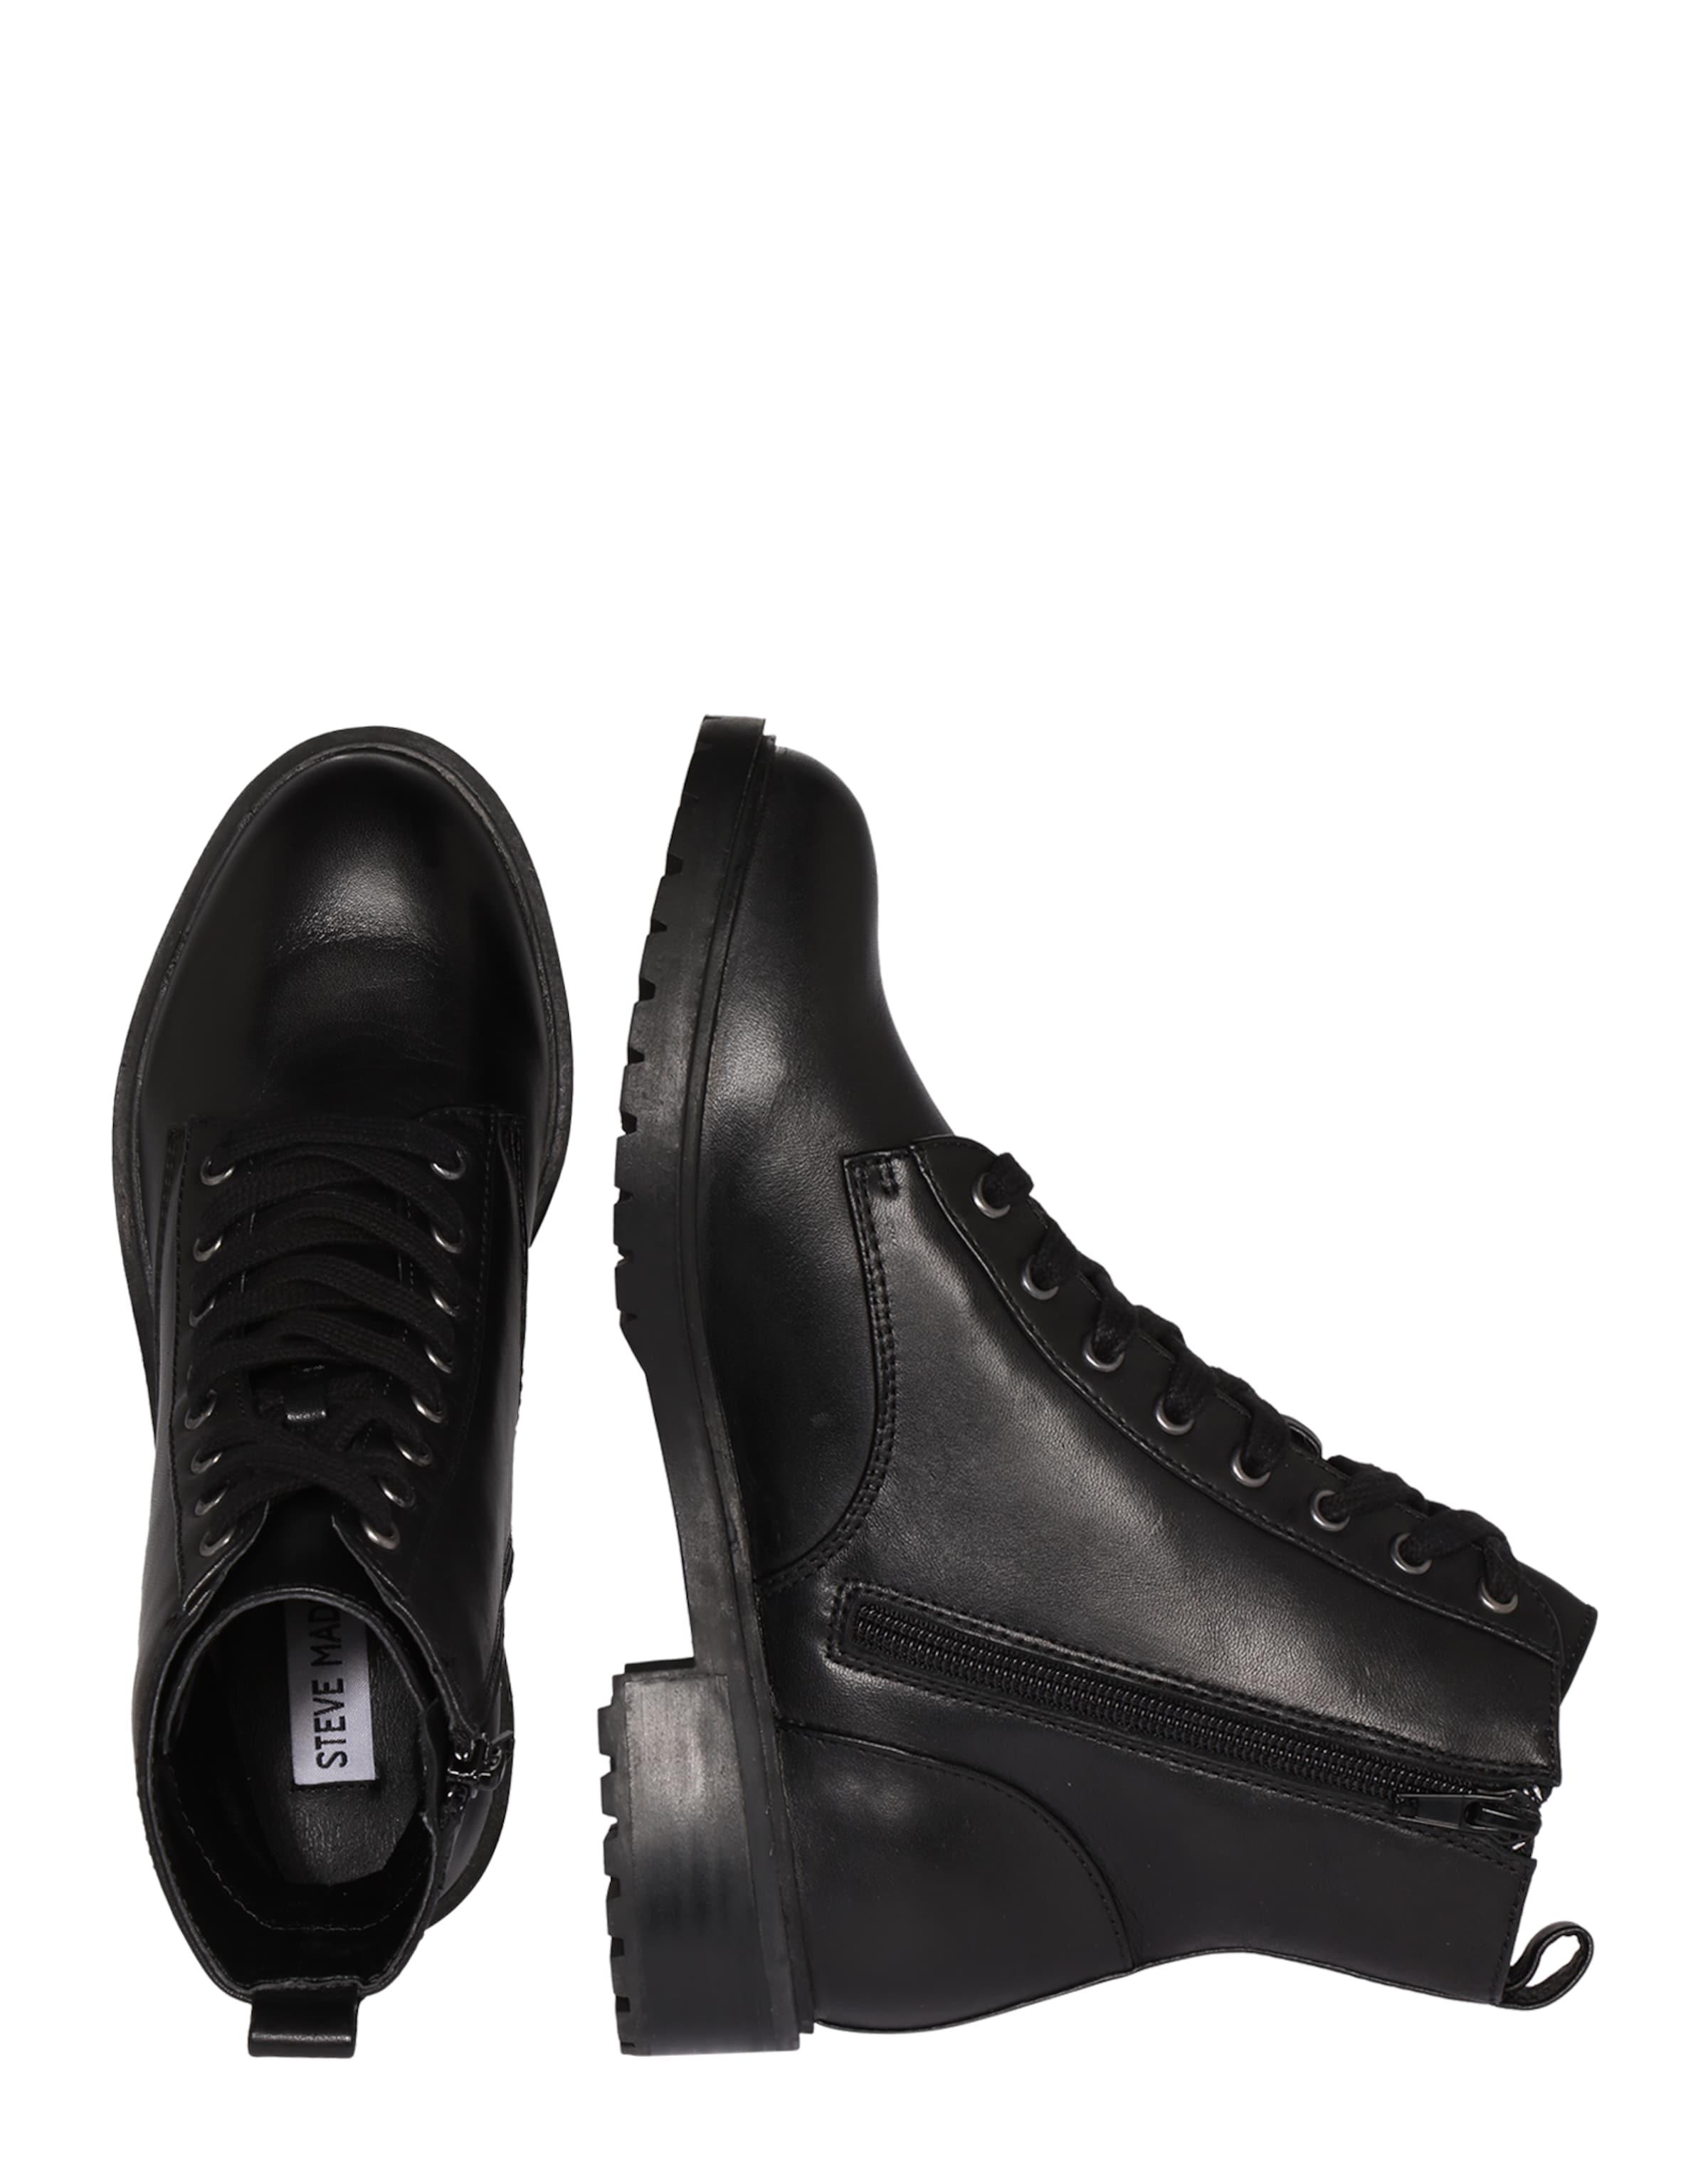 STEVE MADDEN Leder-Boot 'Officer' Billig Verkauf Outlet-Store Verkauf Online-Shop UDkNl